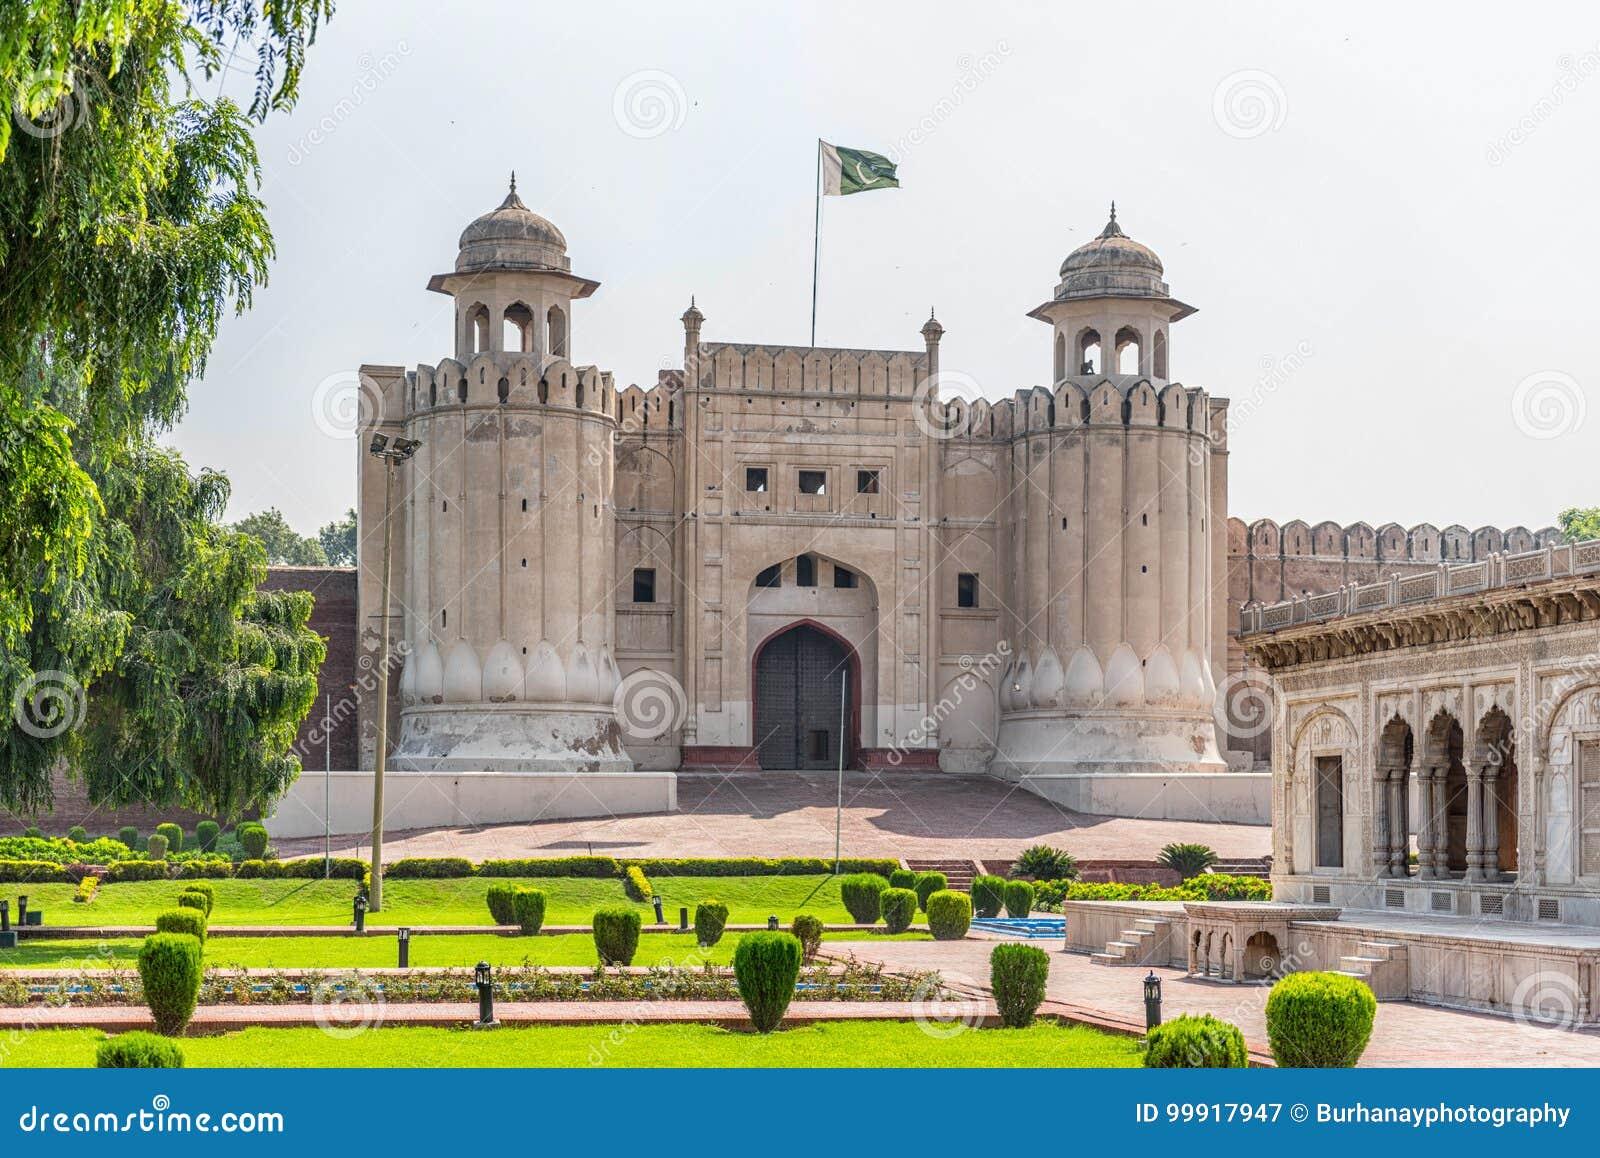 Lahorefort, Lahore, Punjab, Pakistan